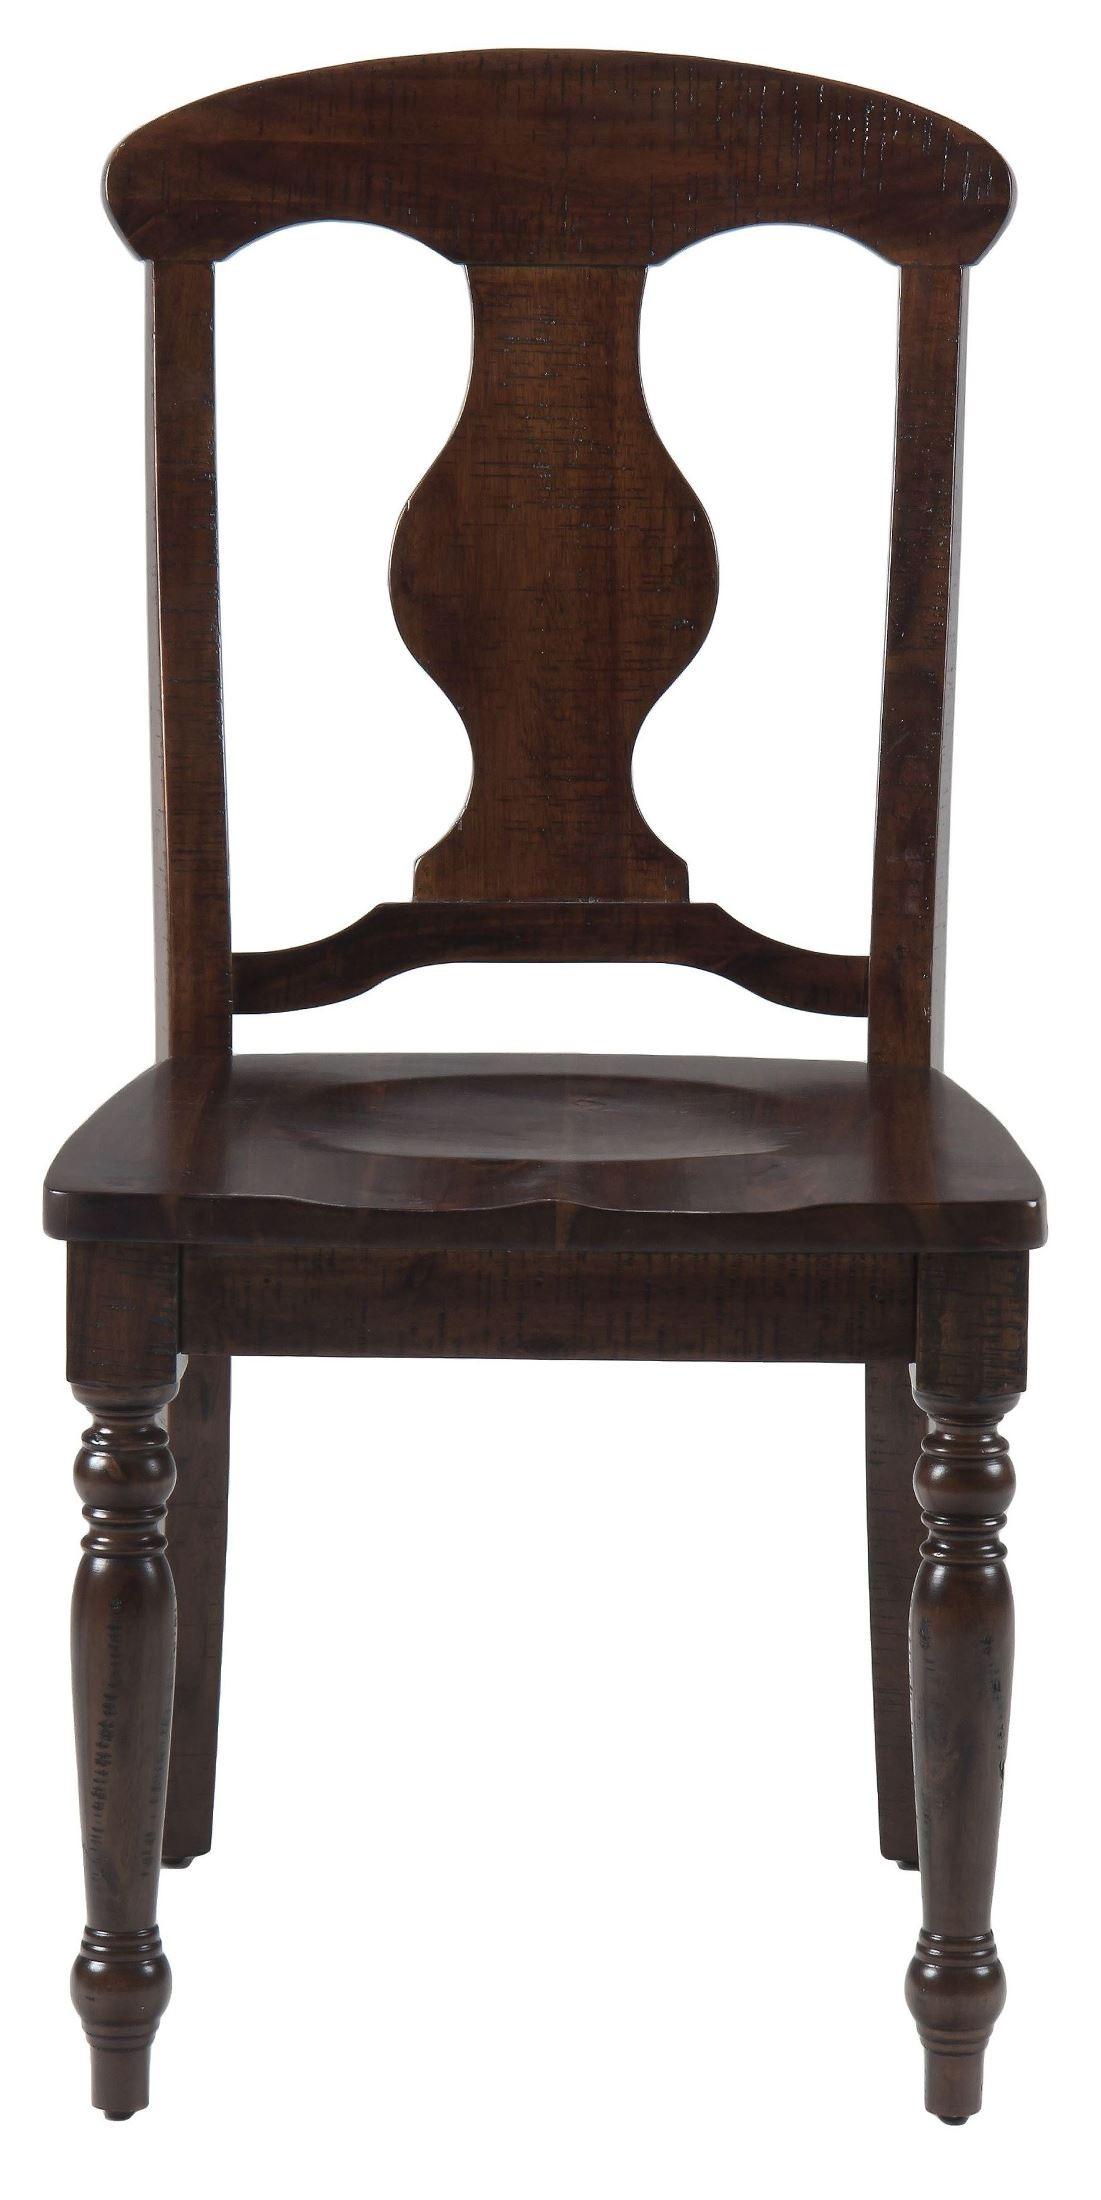 Urban Lodge Napoleon Dining Chair 733 709KD Jofran : 733 709kd from colemanfurniture.com size 1101 x 2200 jpeg 188kB